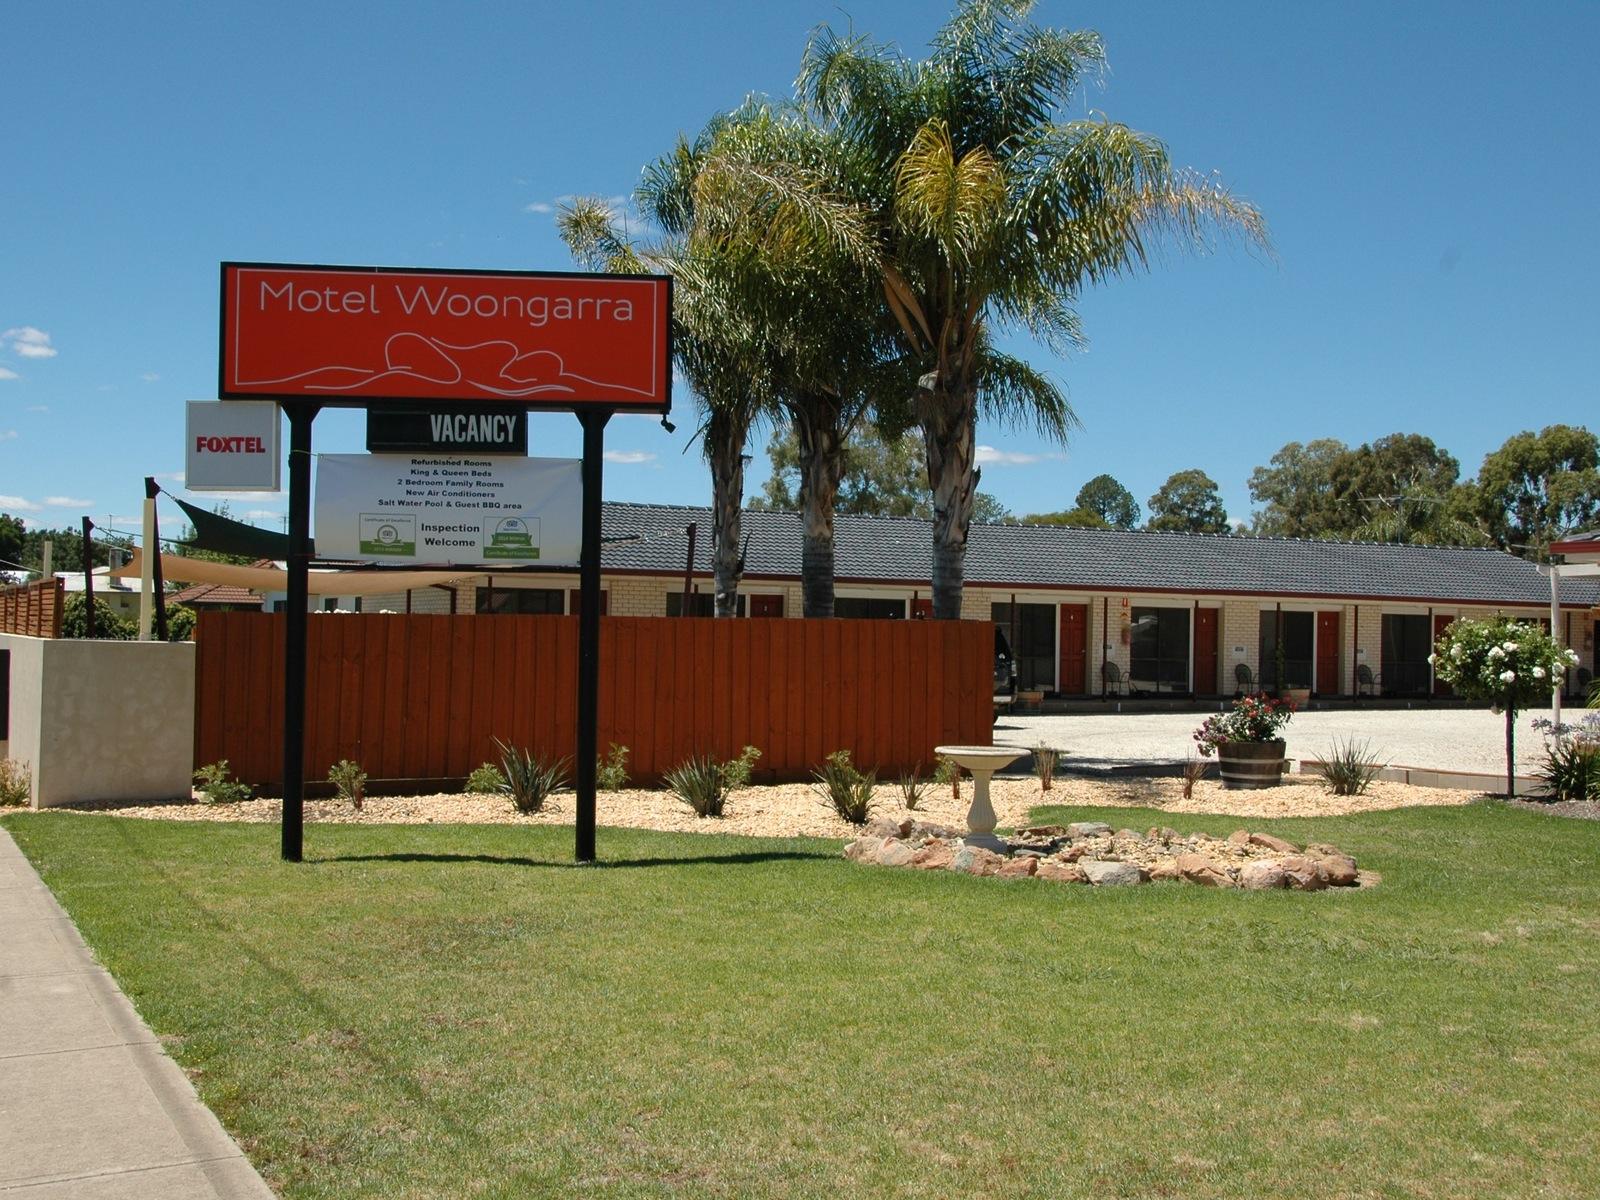 Motel Woongarra